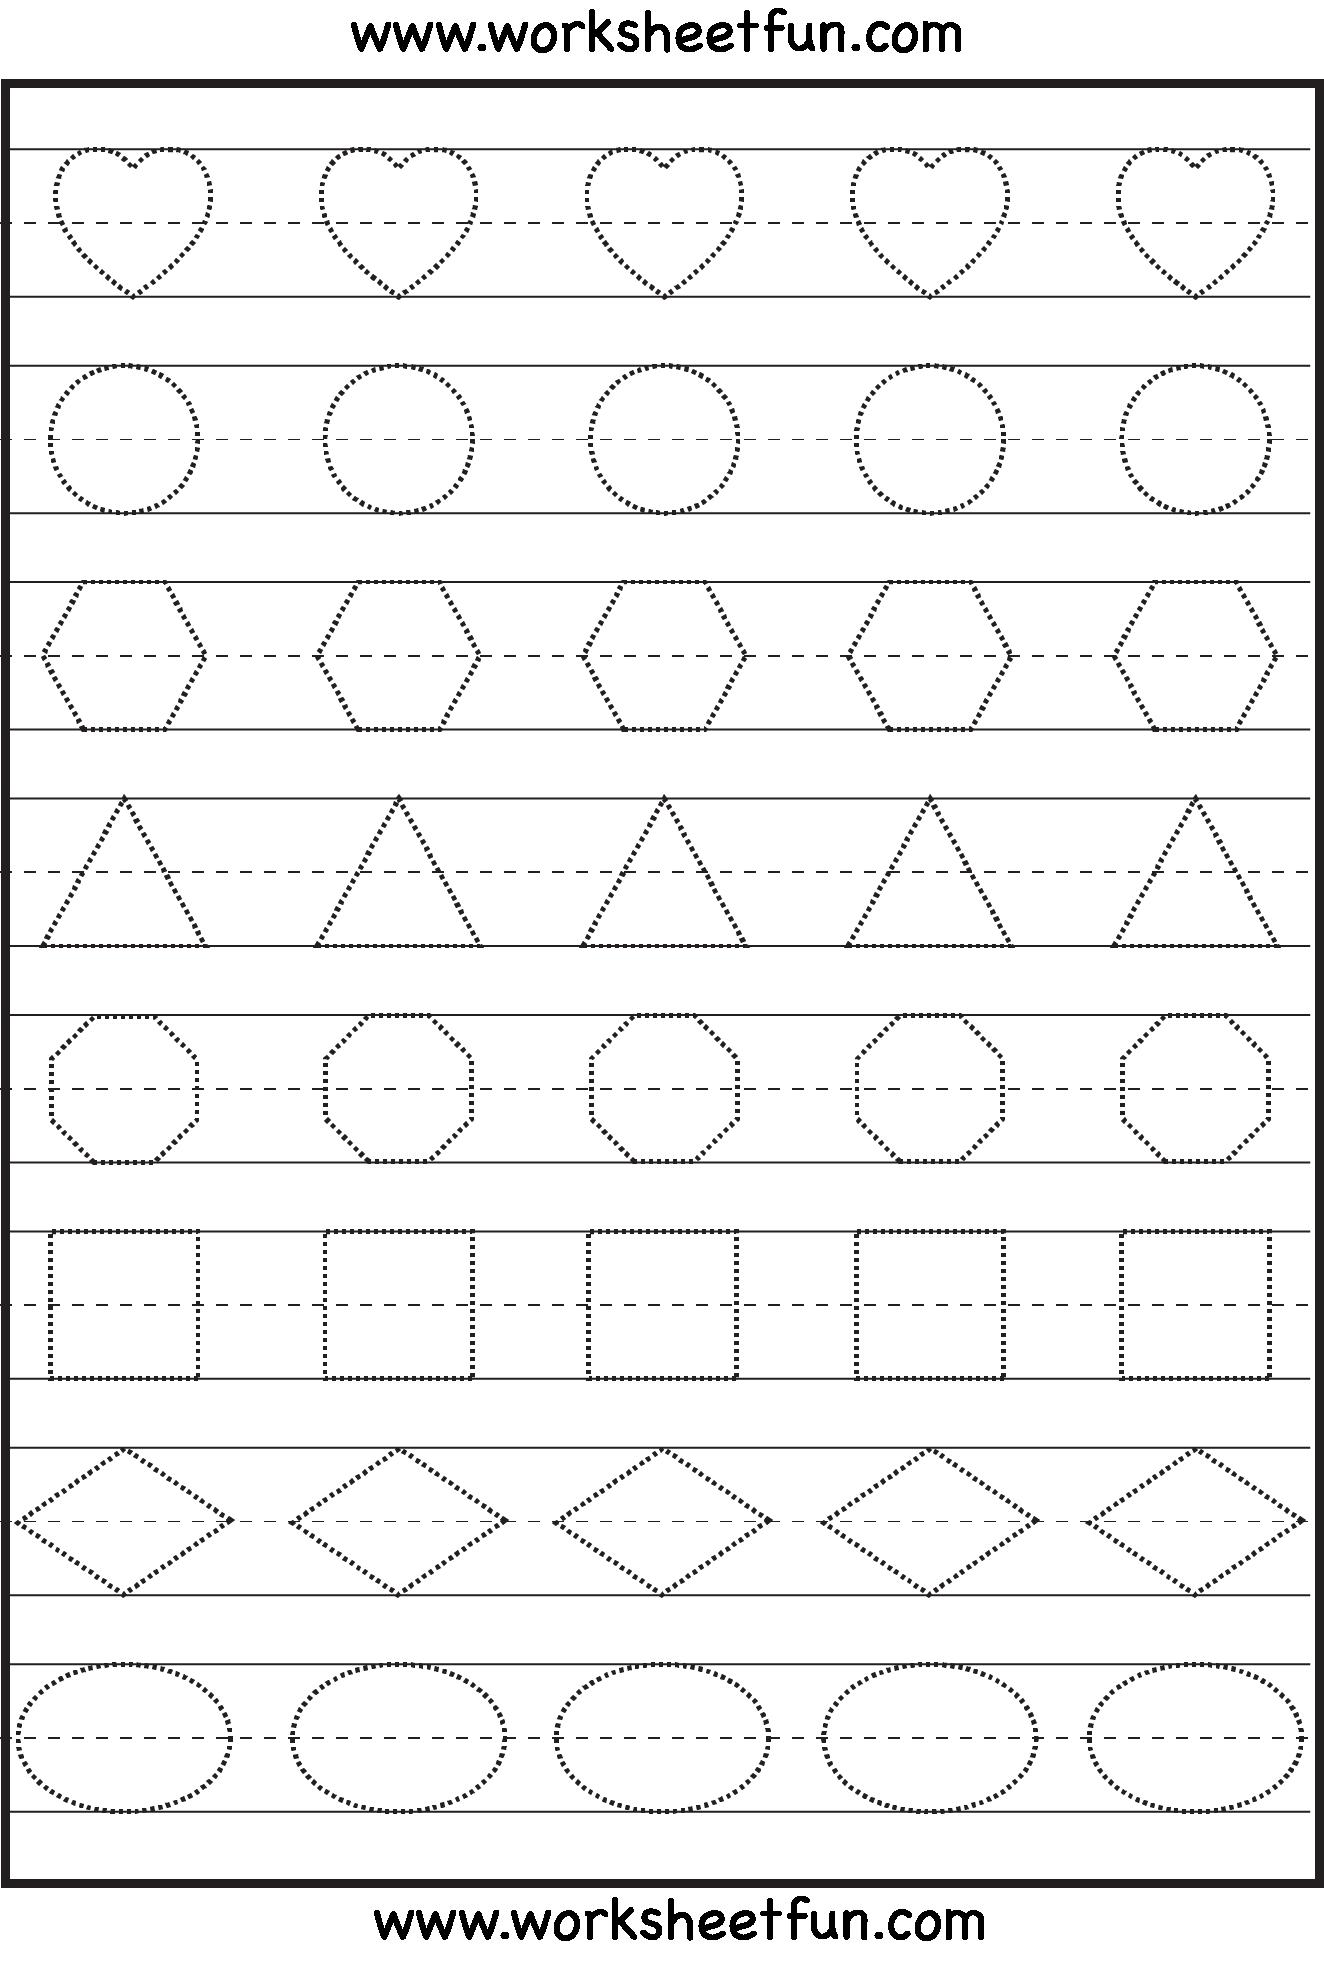 5 Images of Free Printable Preschool Activity Worksheets